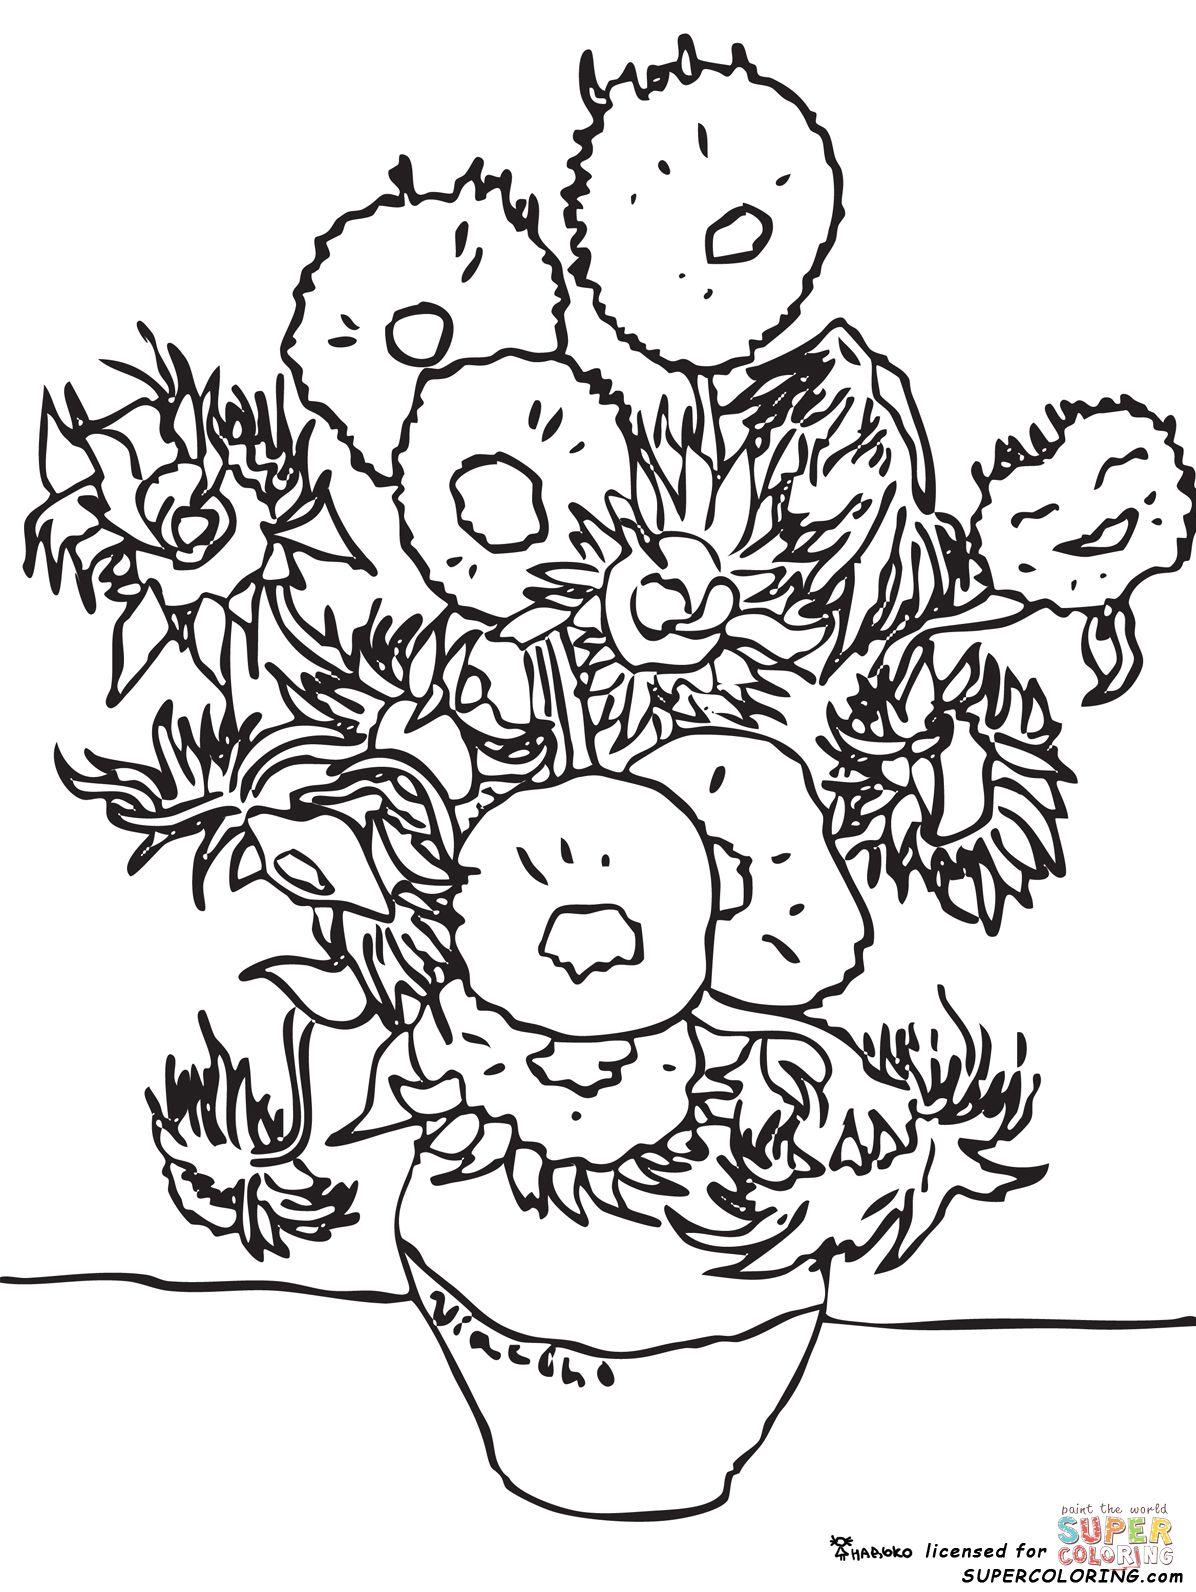 Sunflowers By Vincent Van Gogh Van Gogh Coloring Sunflower Colors Sunflower Coloring Pages